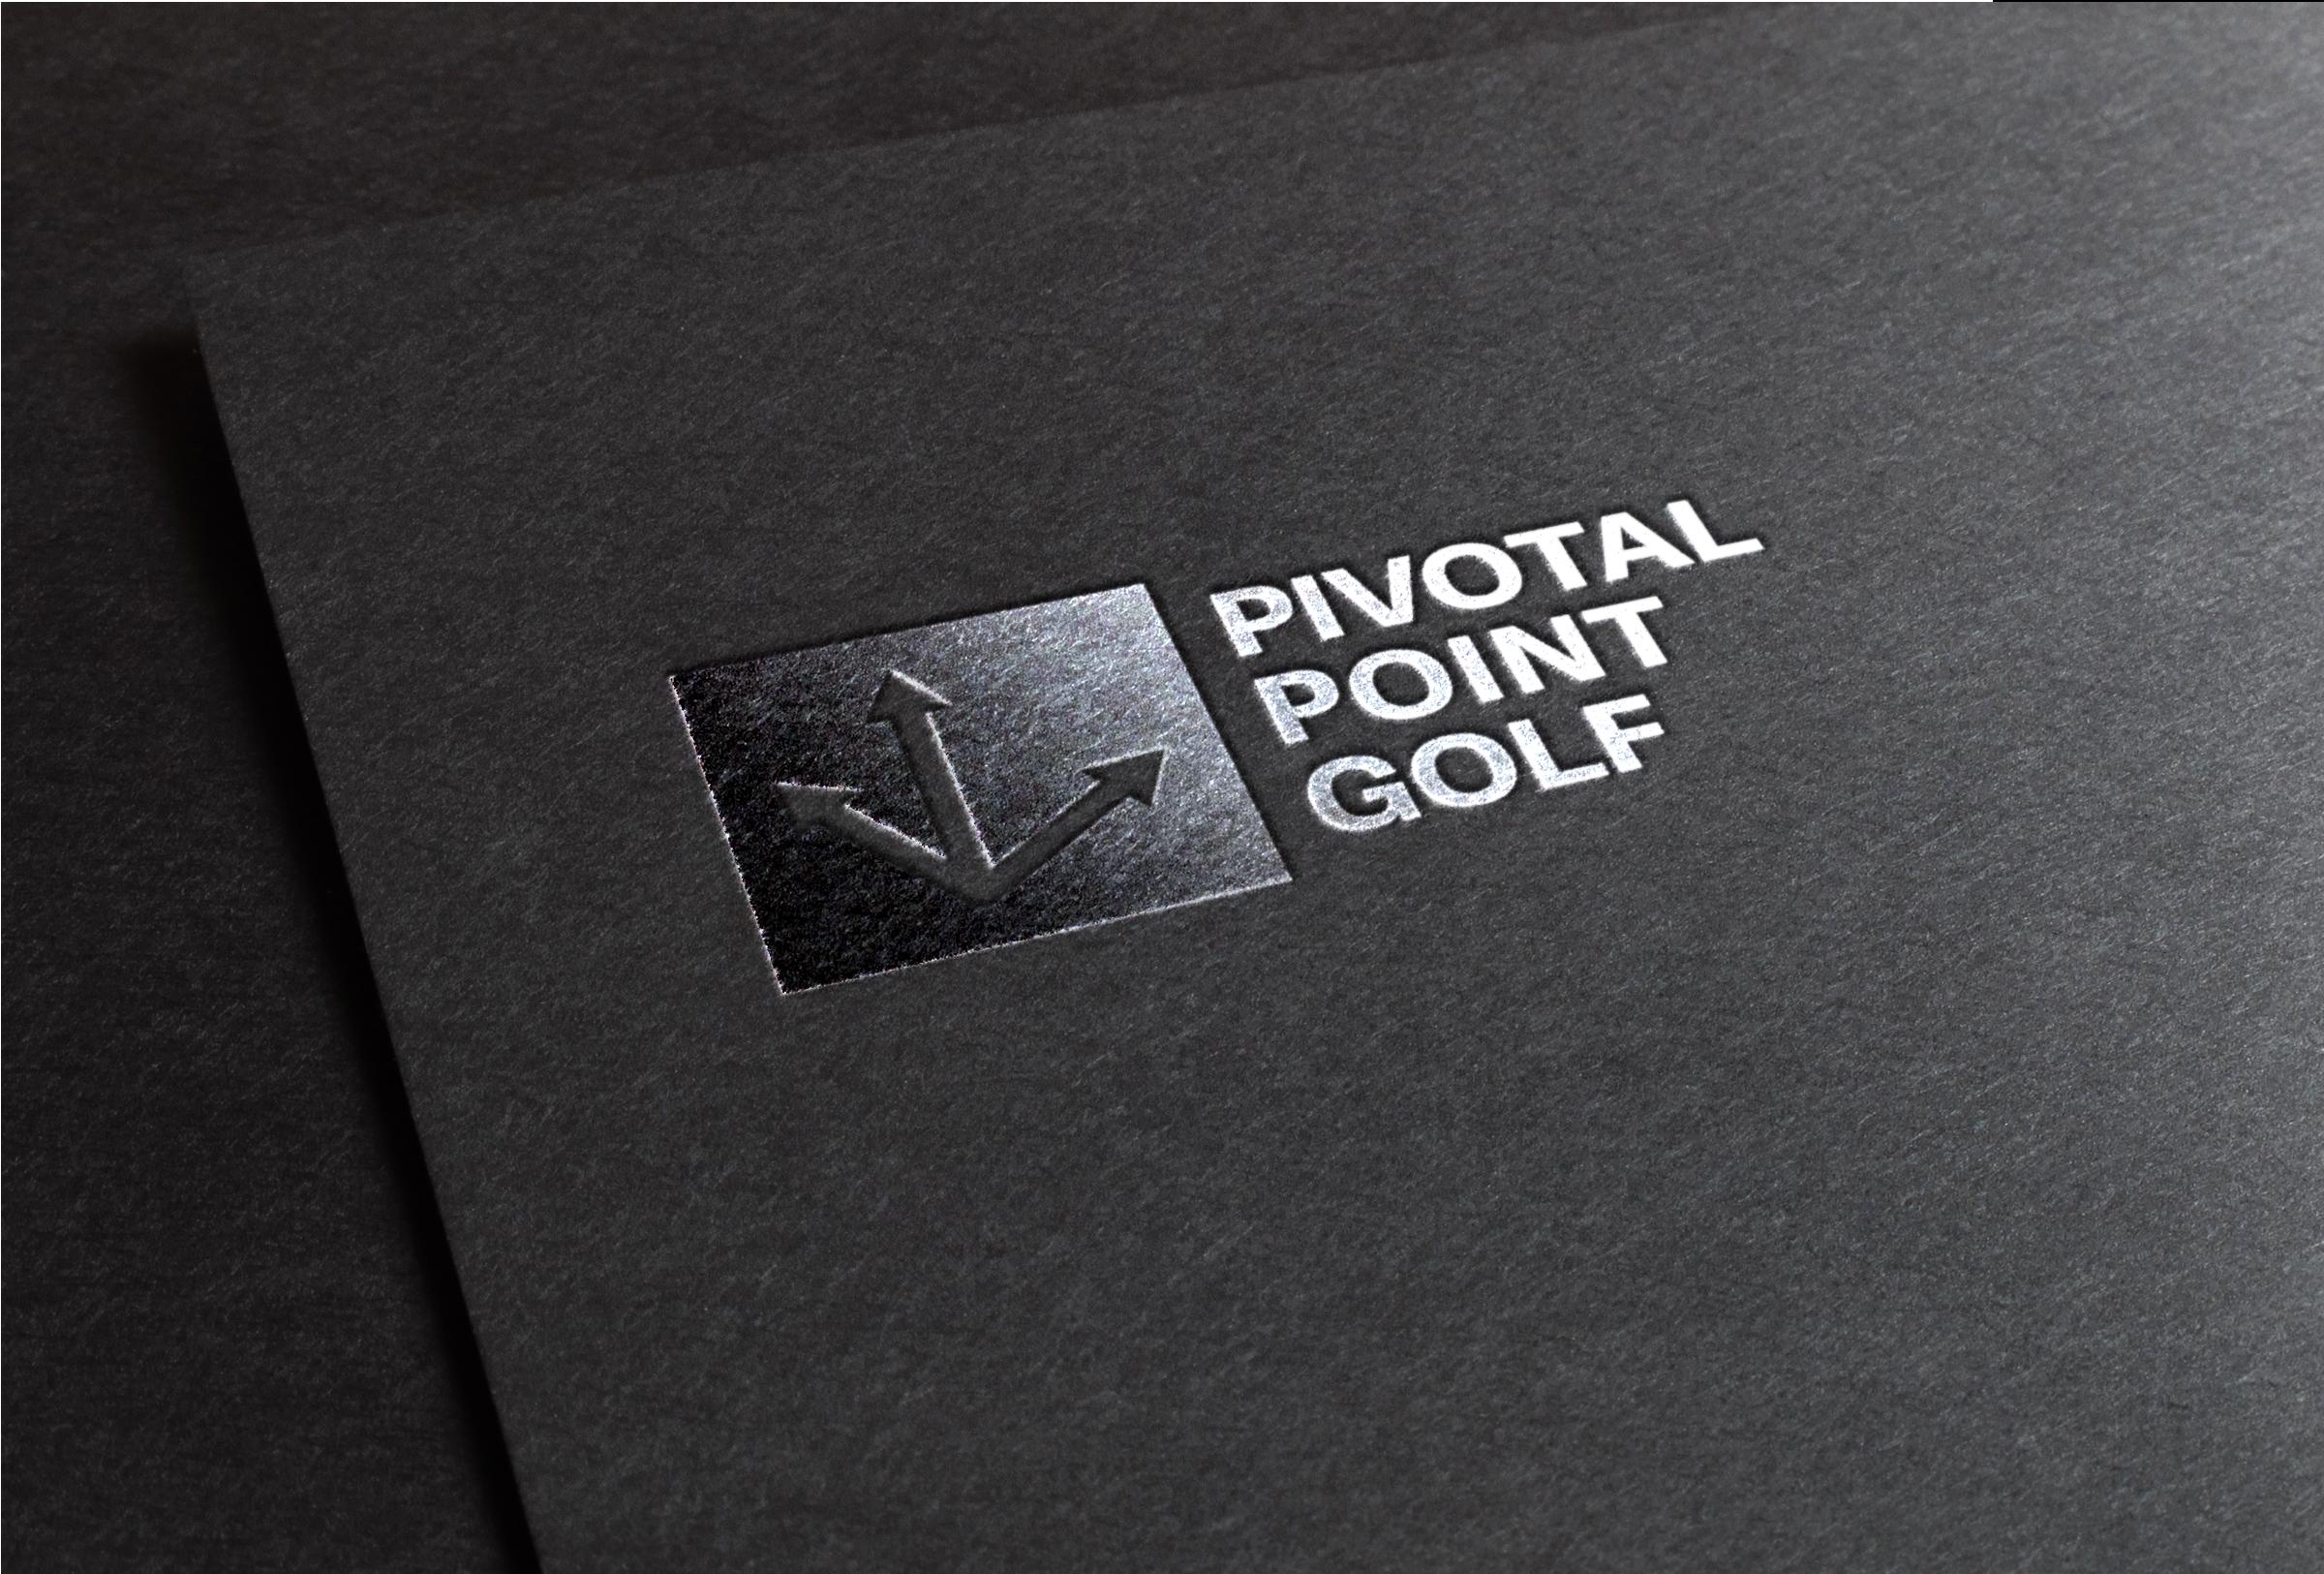 Pivotal Point Golf Executive Folder